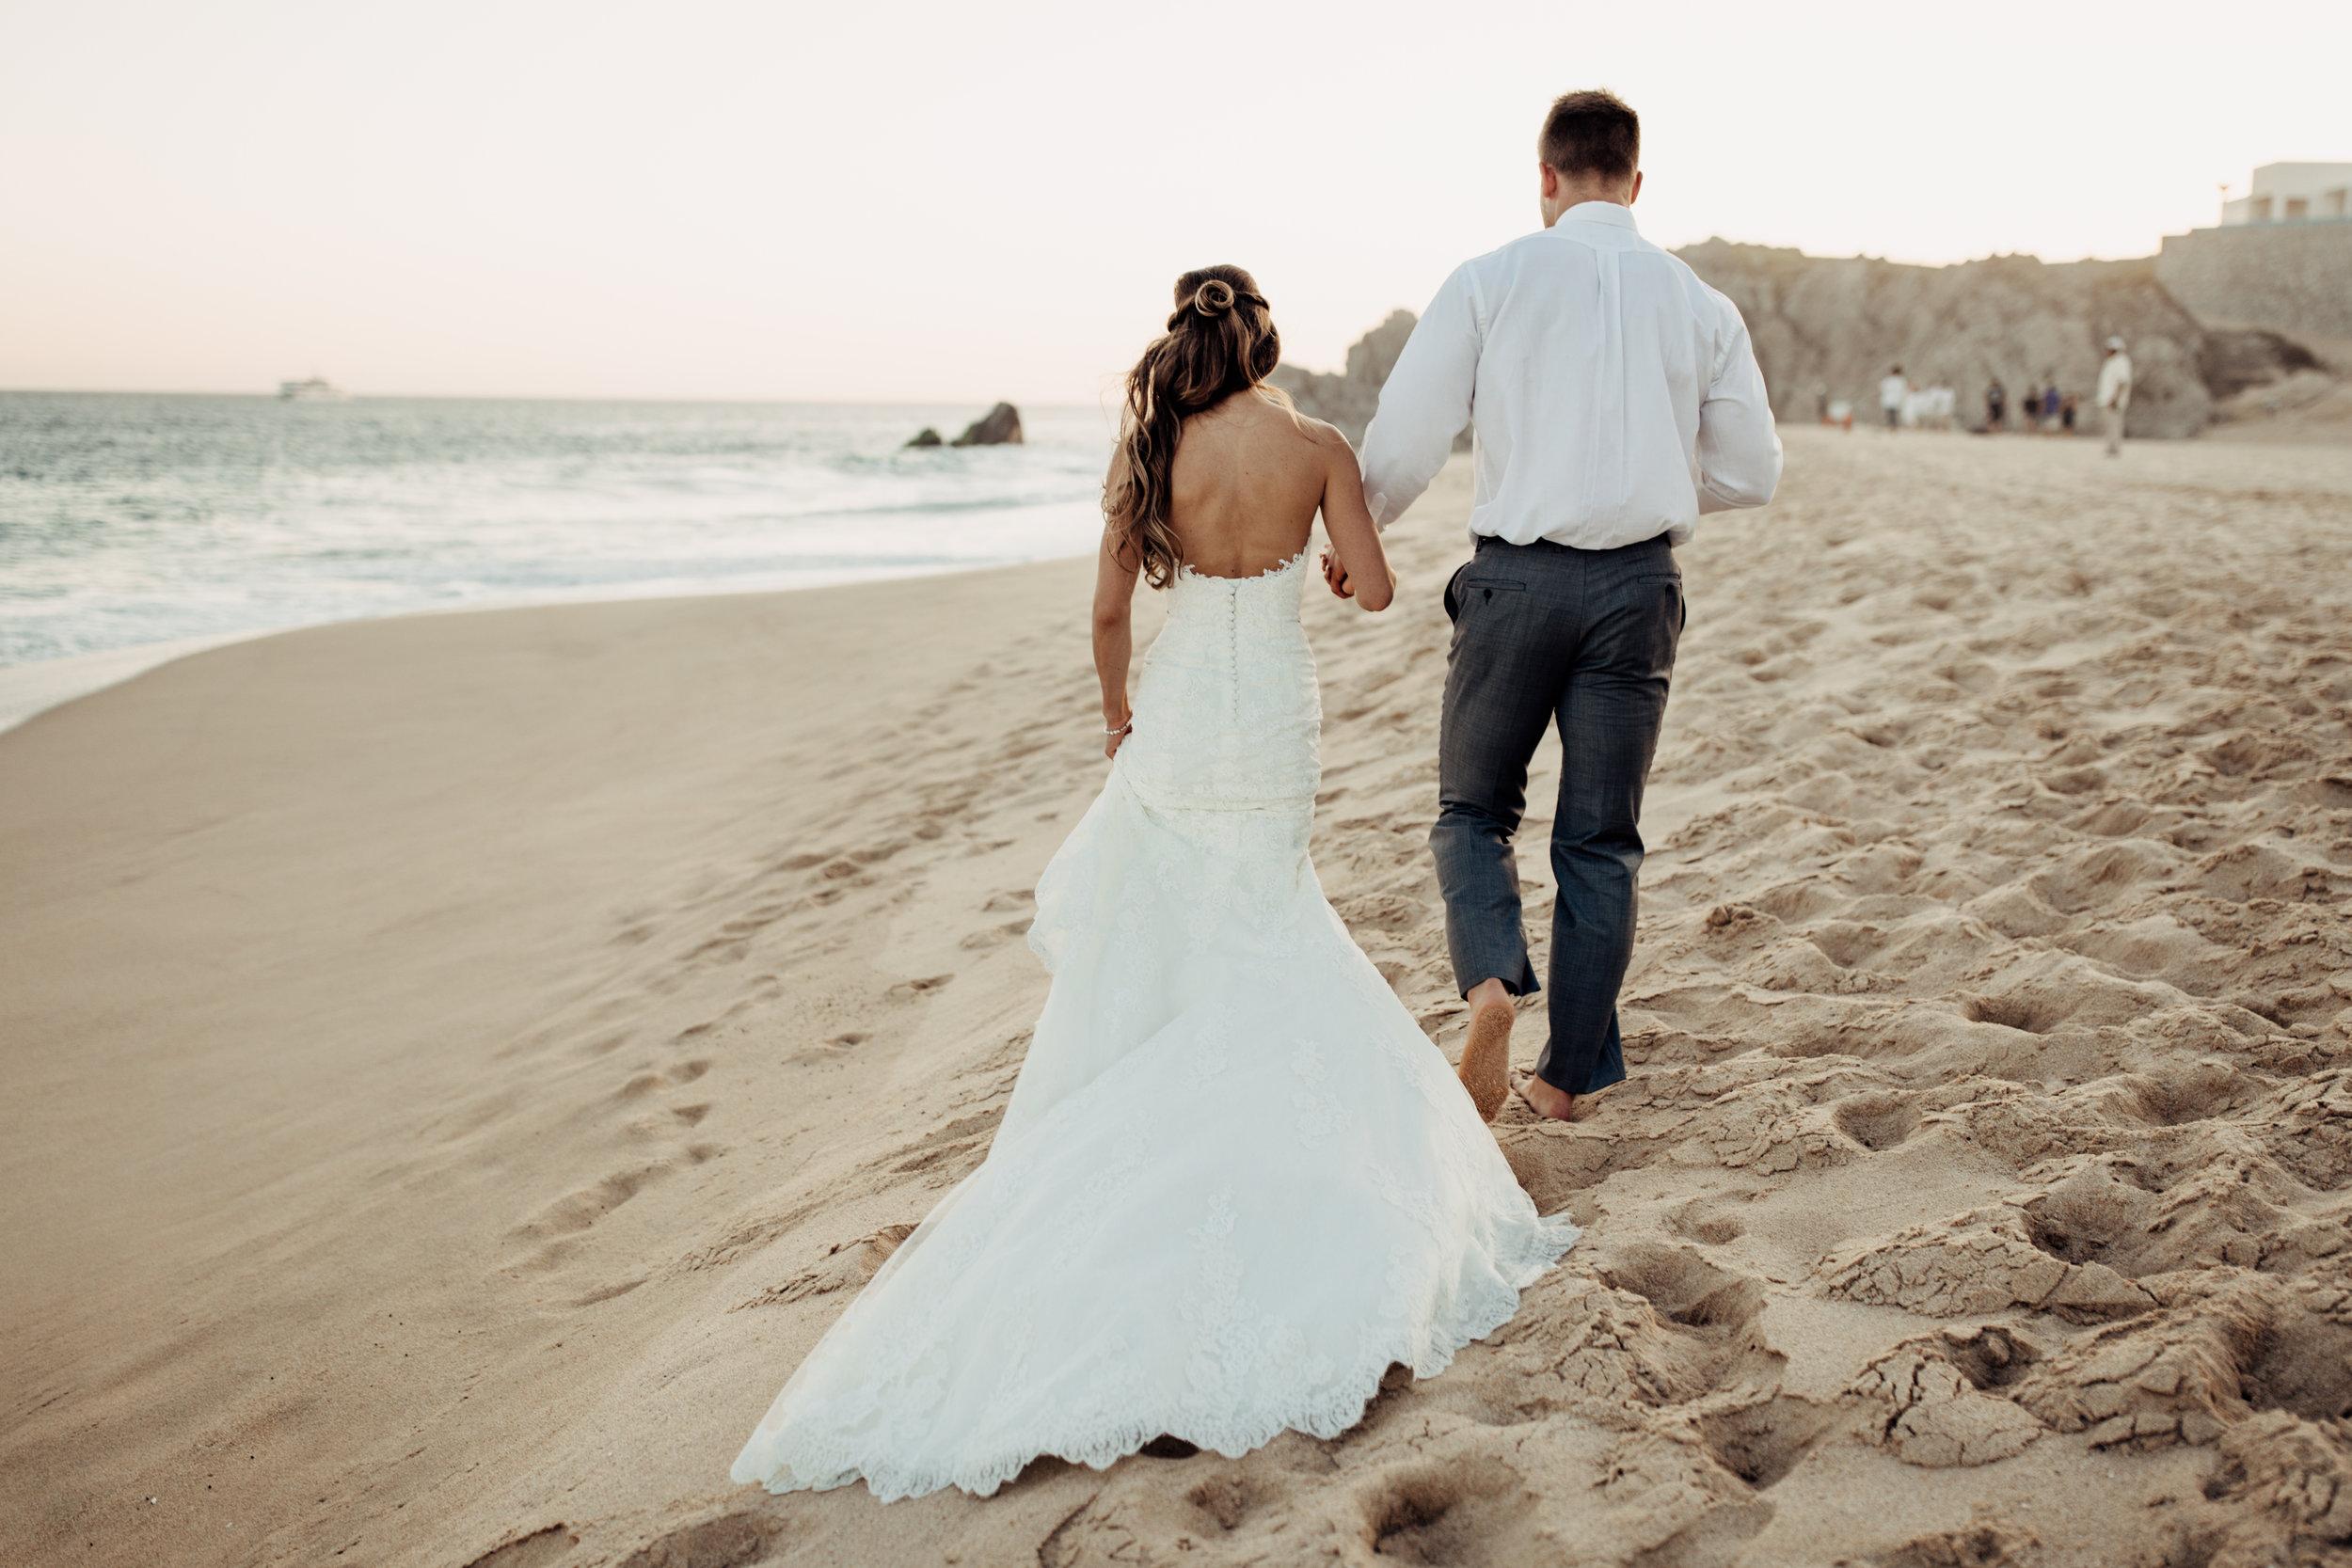 pueblo-bonito-sunset-beach-wedding-cabo-san-lucas483.jpg